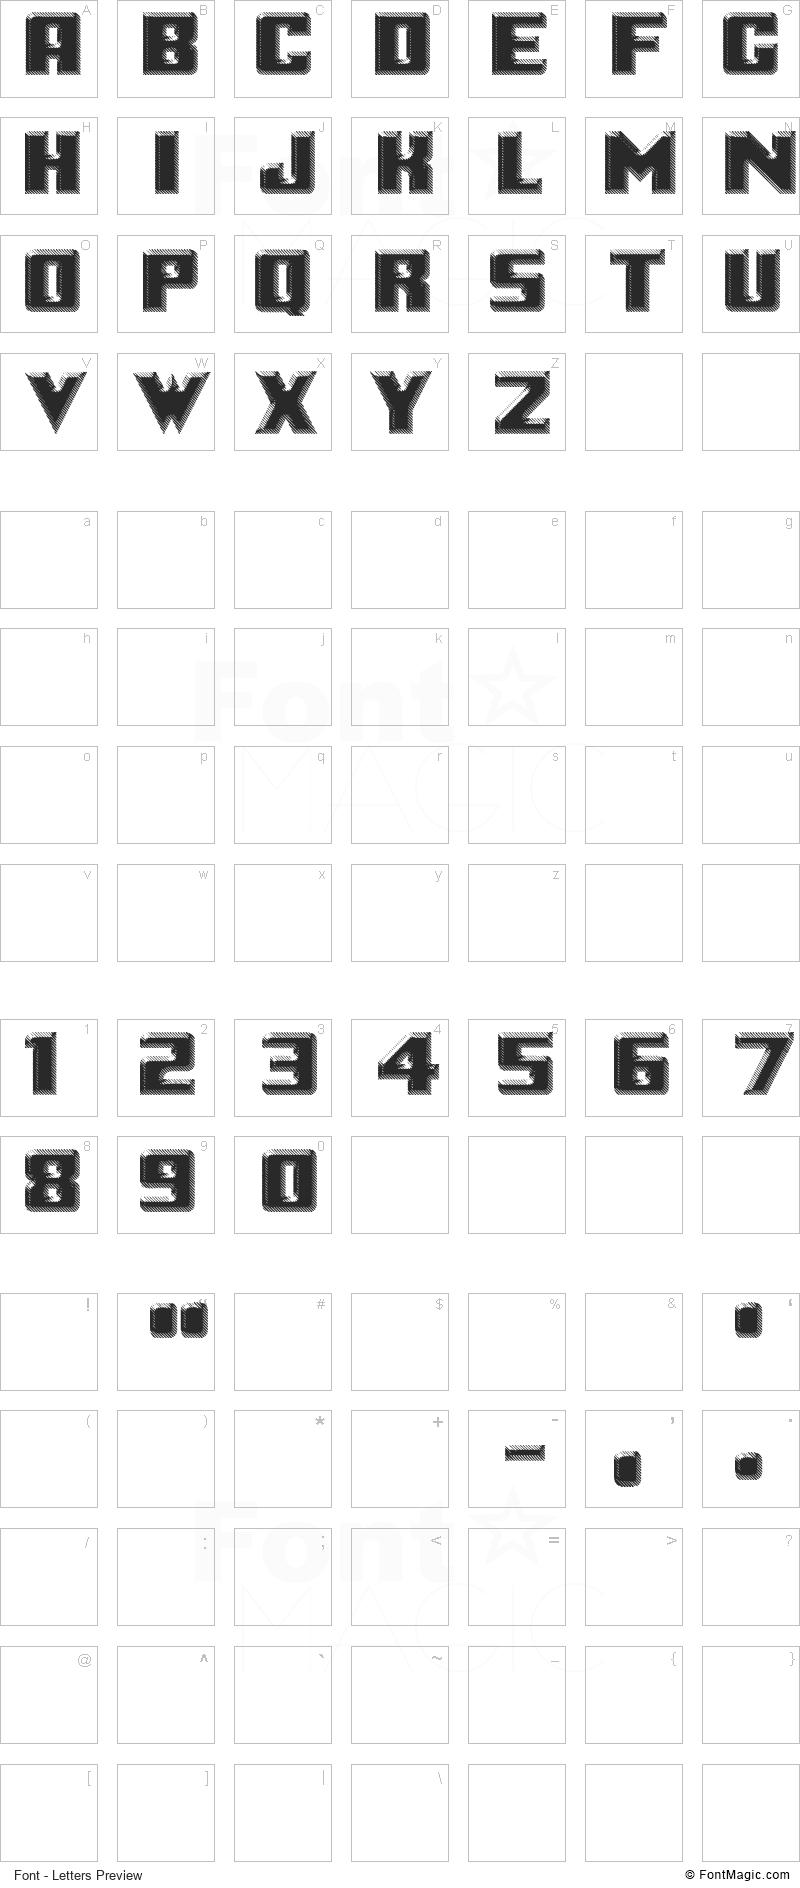 LOGOTRONIK Font - All Latters Preview Chart